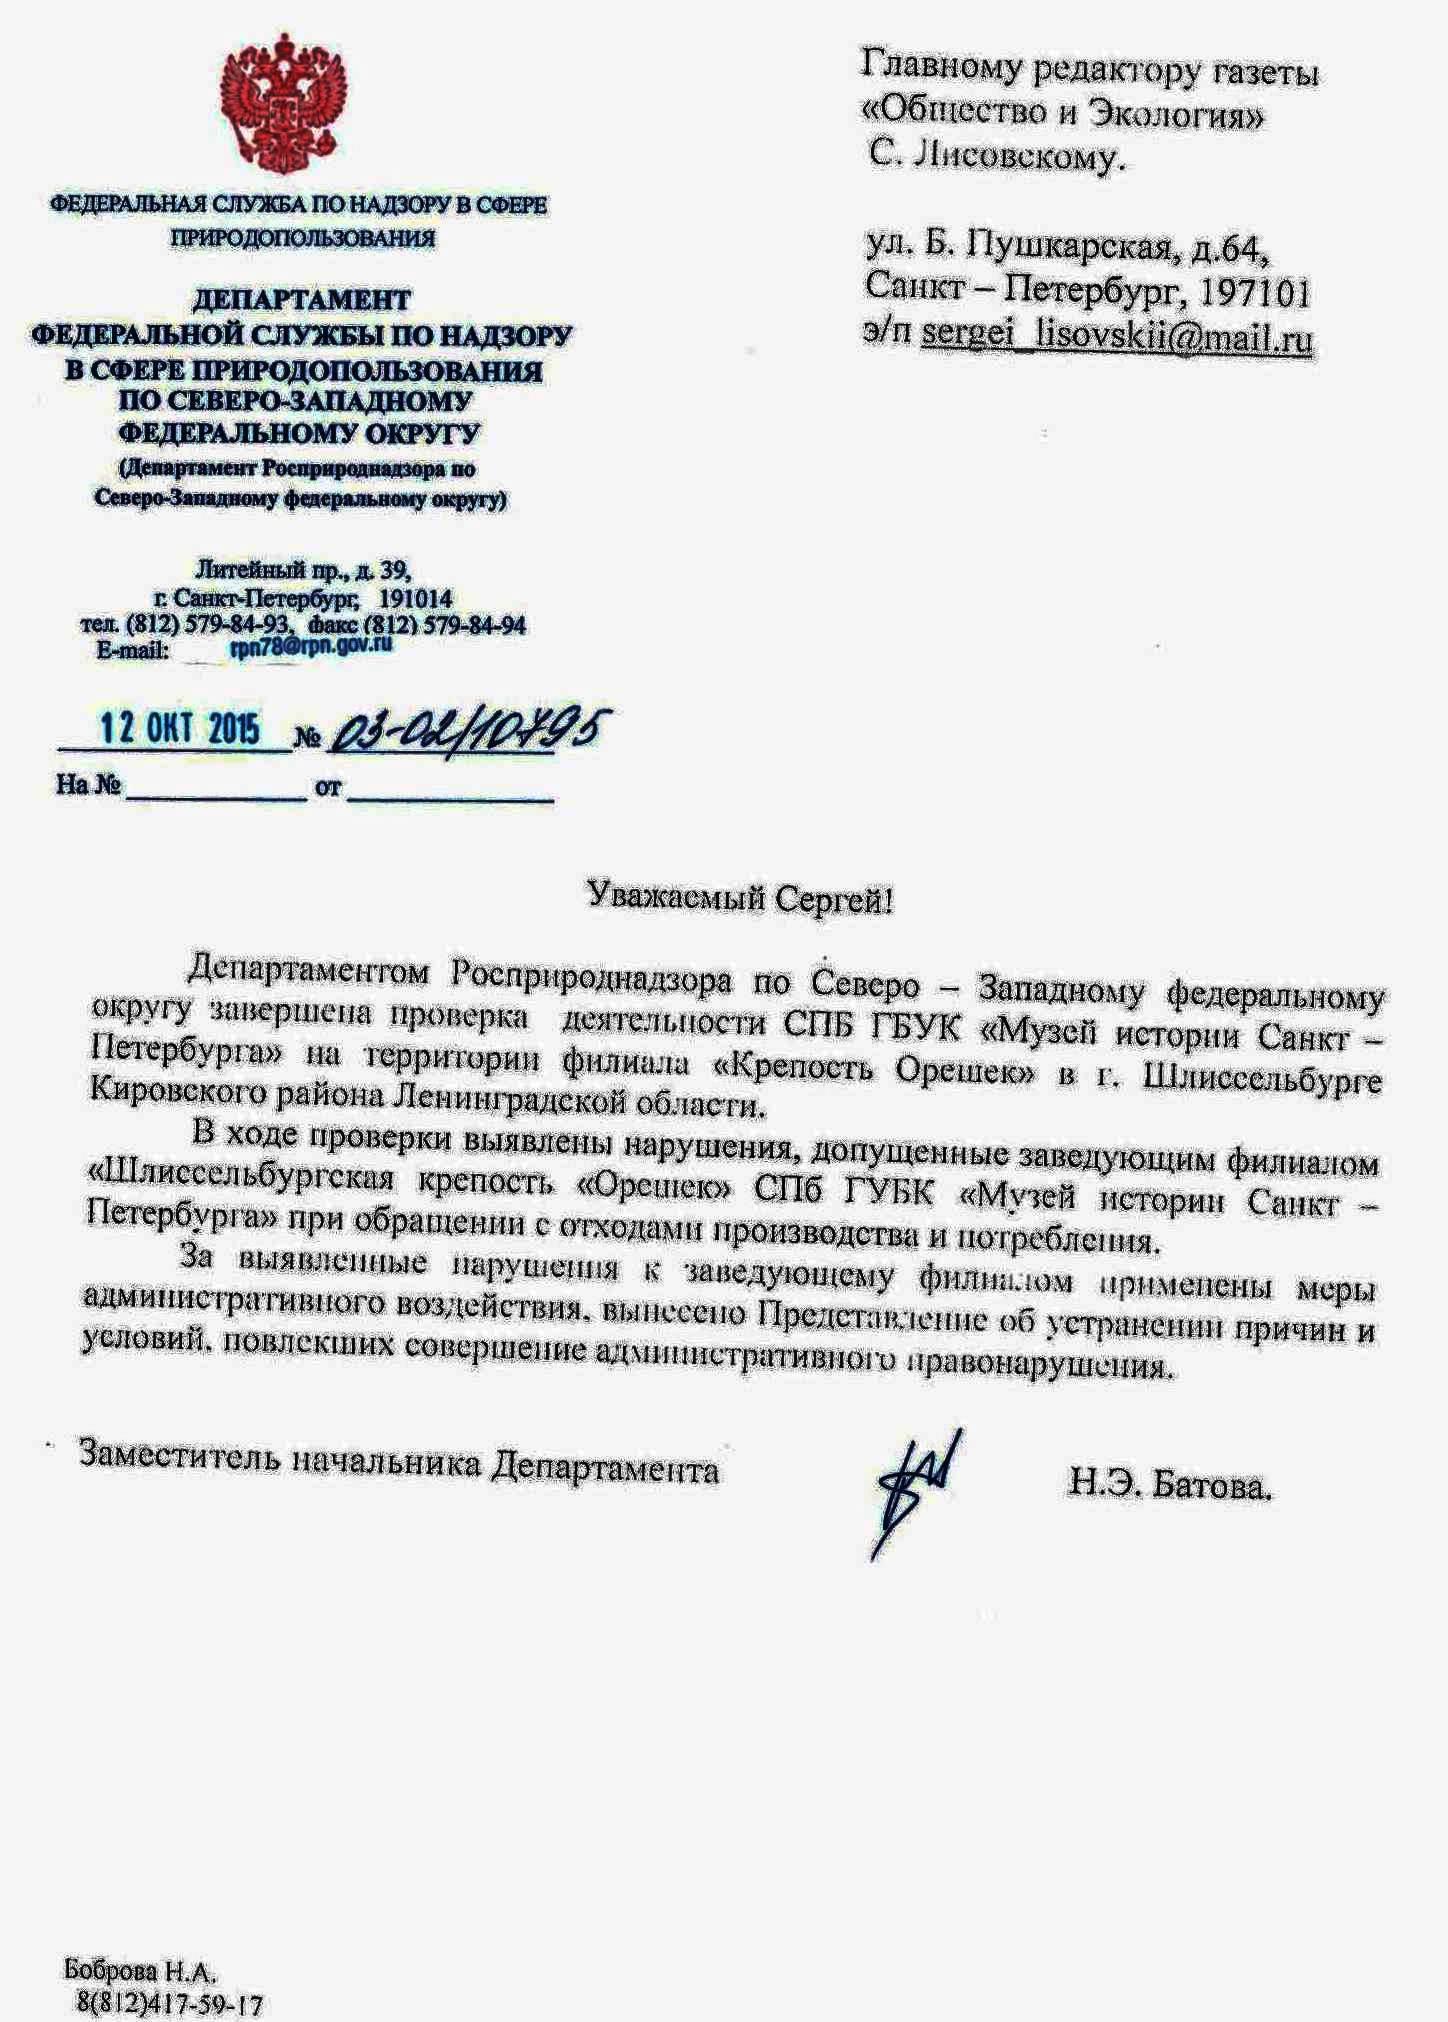 Oreshek Rosprirod PSM Lis 12 okt 2015